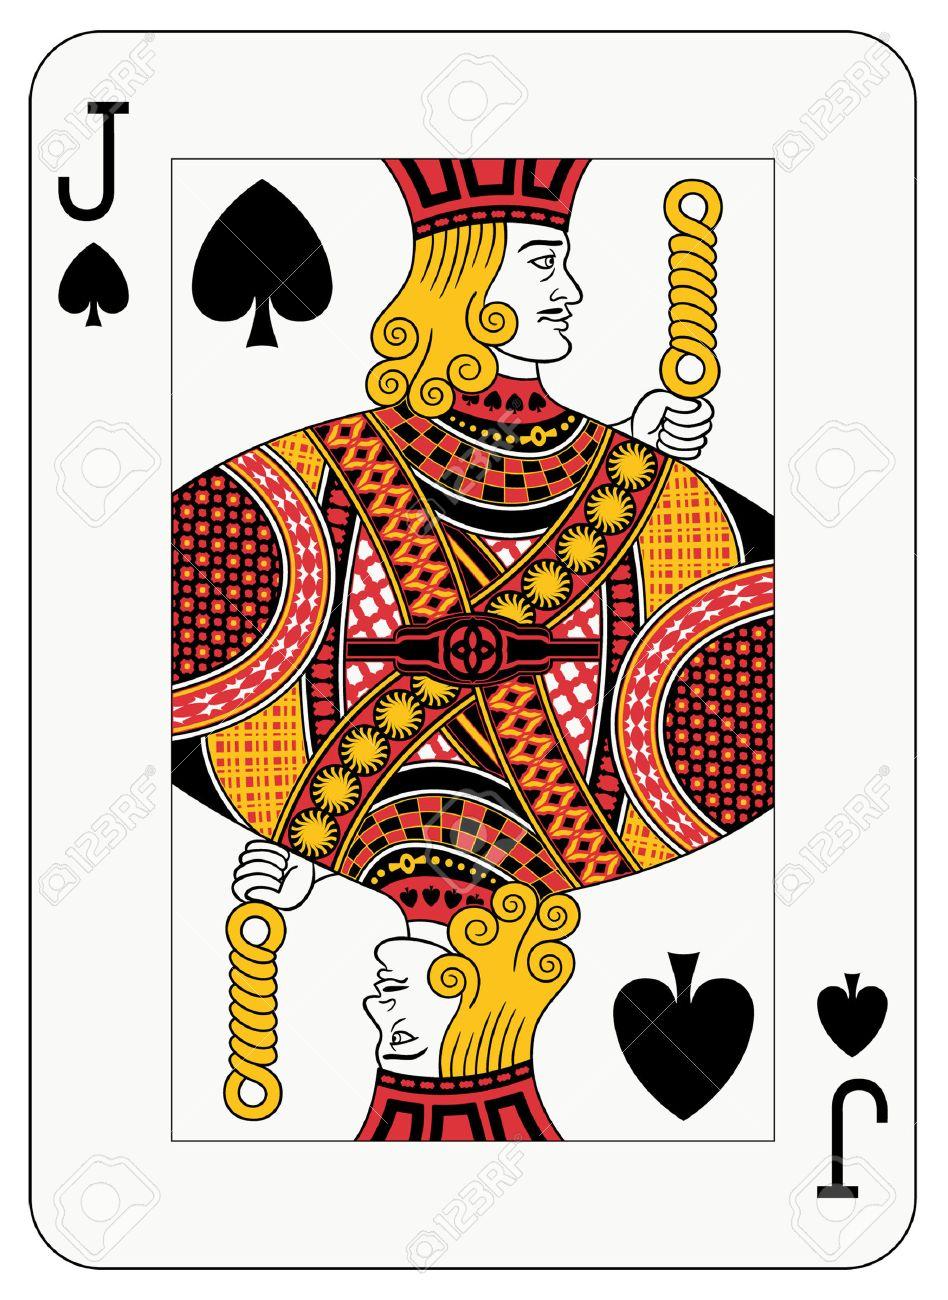 jack of spade card  Jack of spades playing card